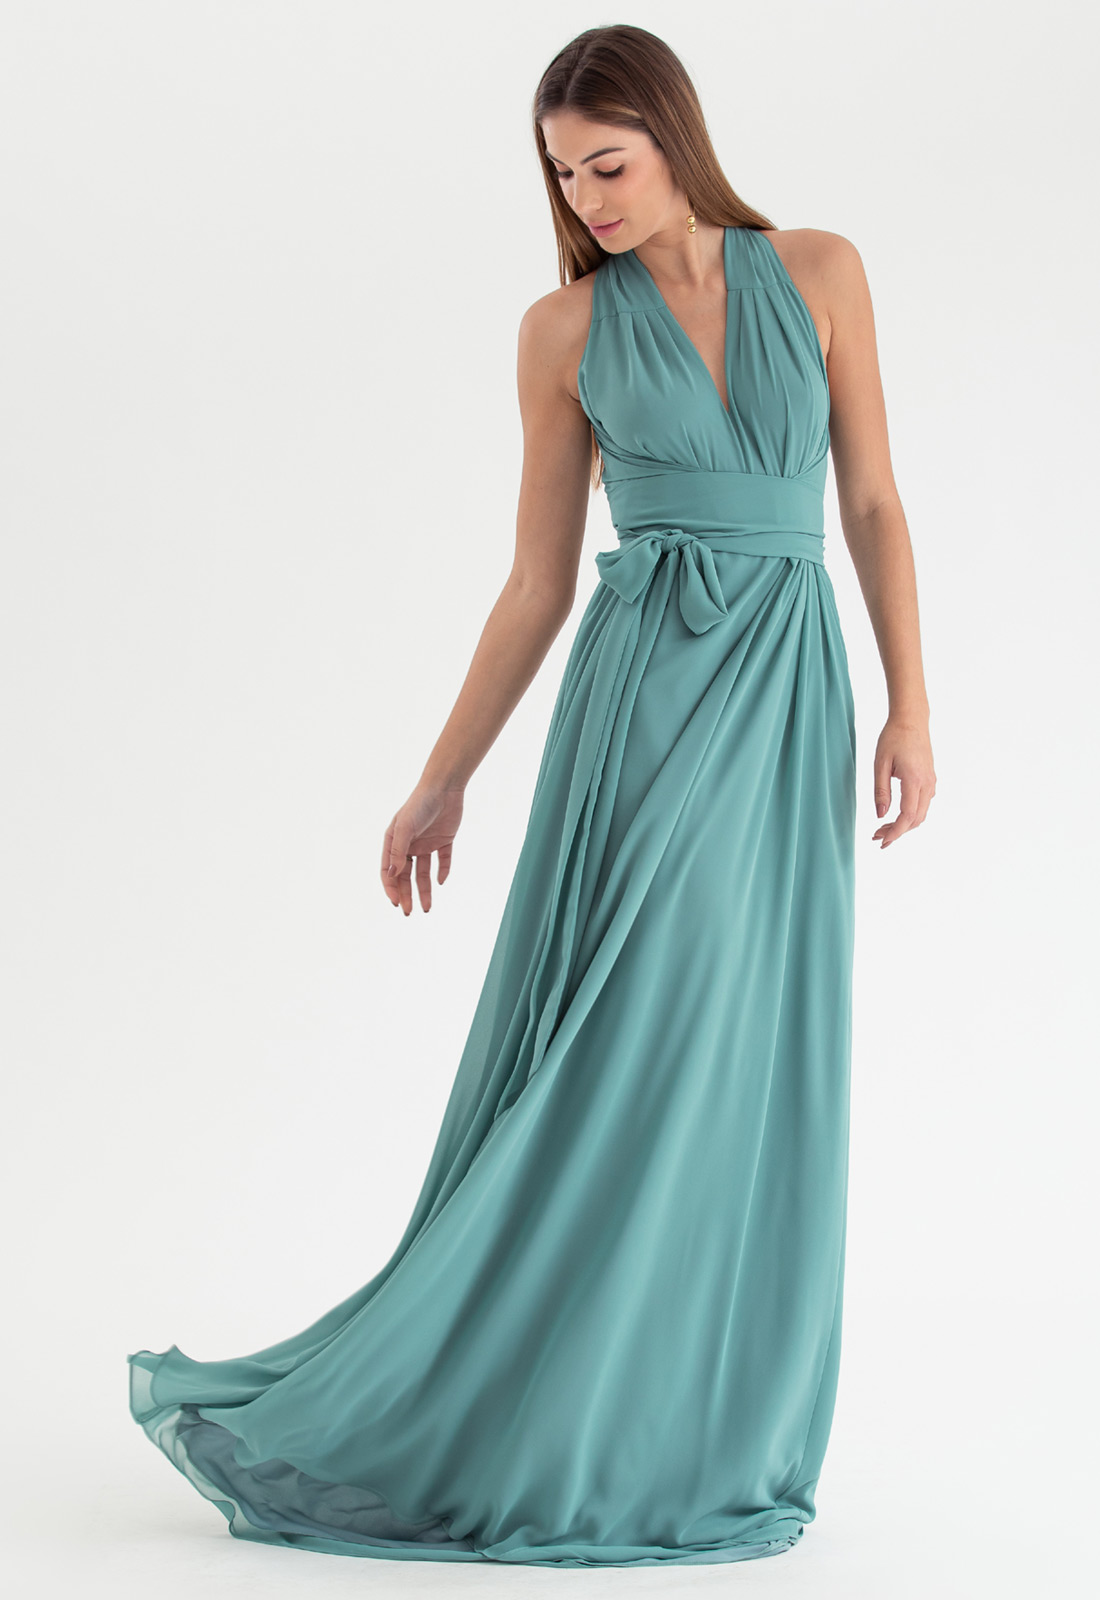 Vestido de festa verde salvia multi-tamanho Ref. 2580